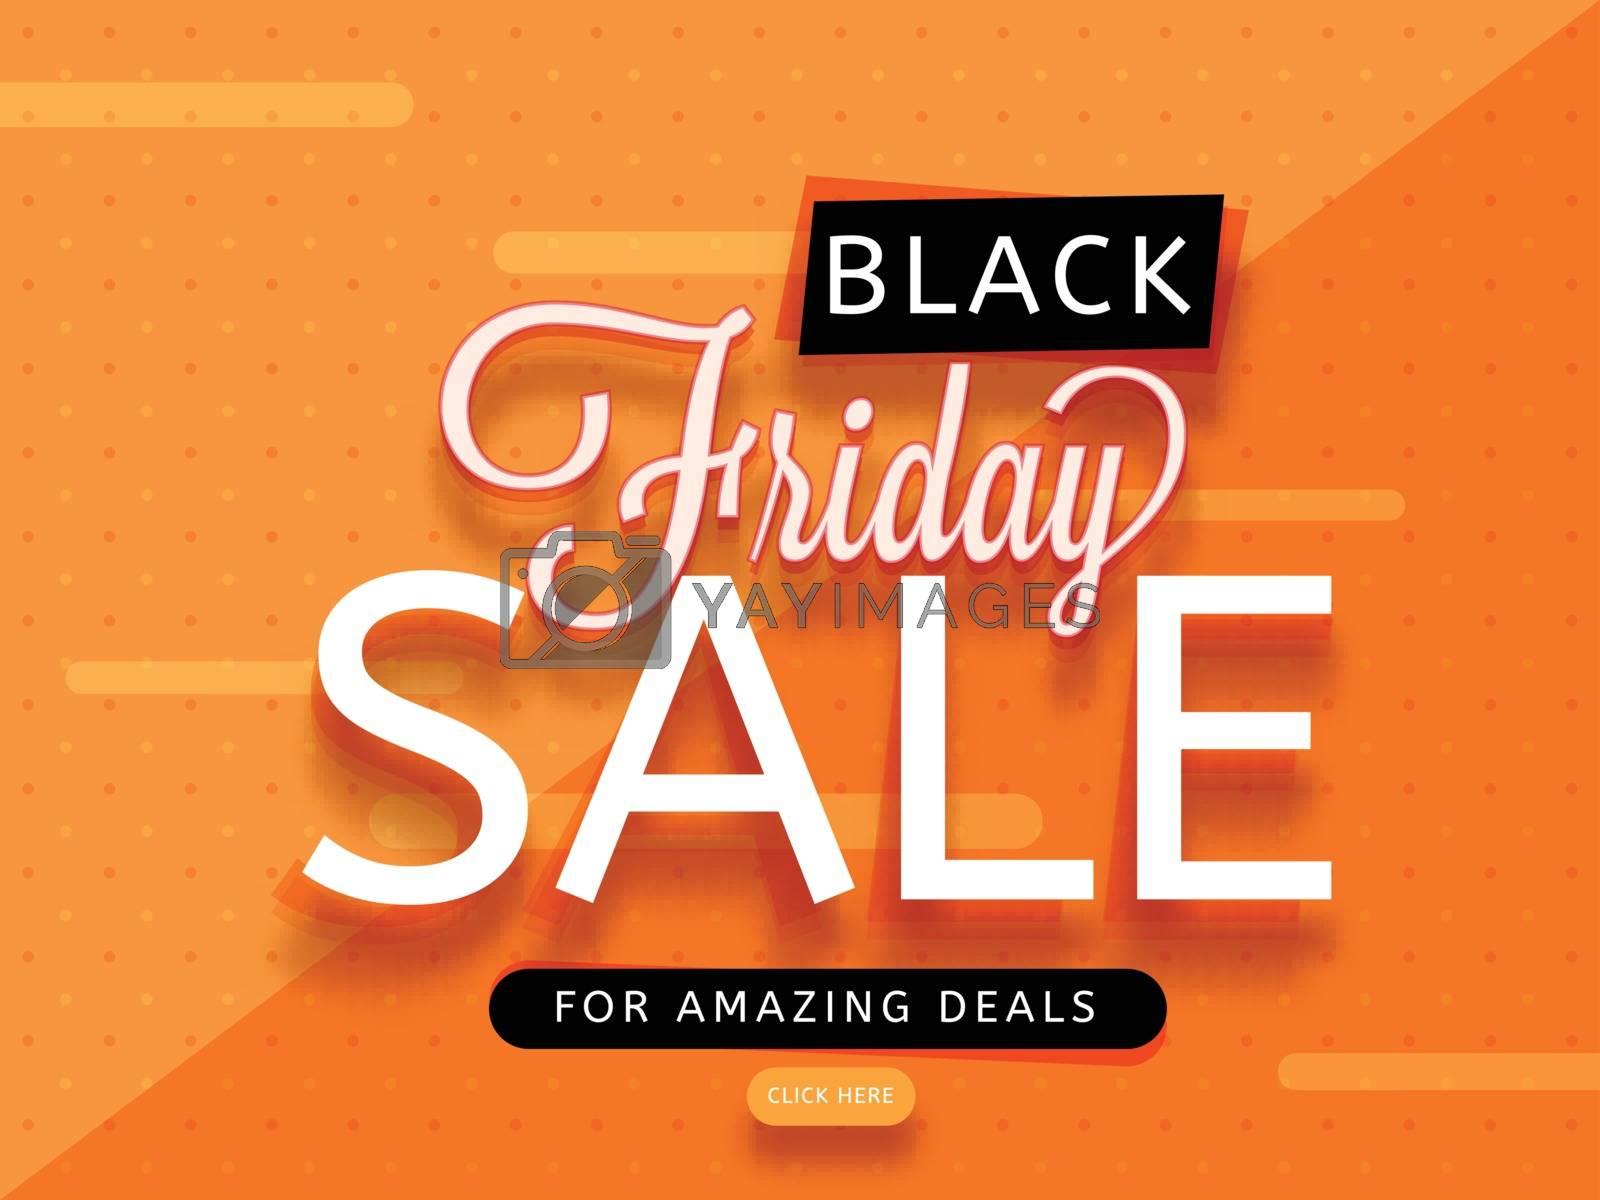 Stylish text Black Friday Sale on orange background, Advertising banner or poster design.